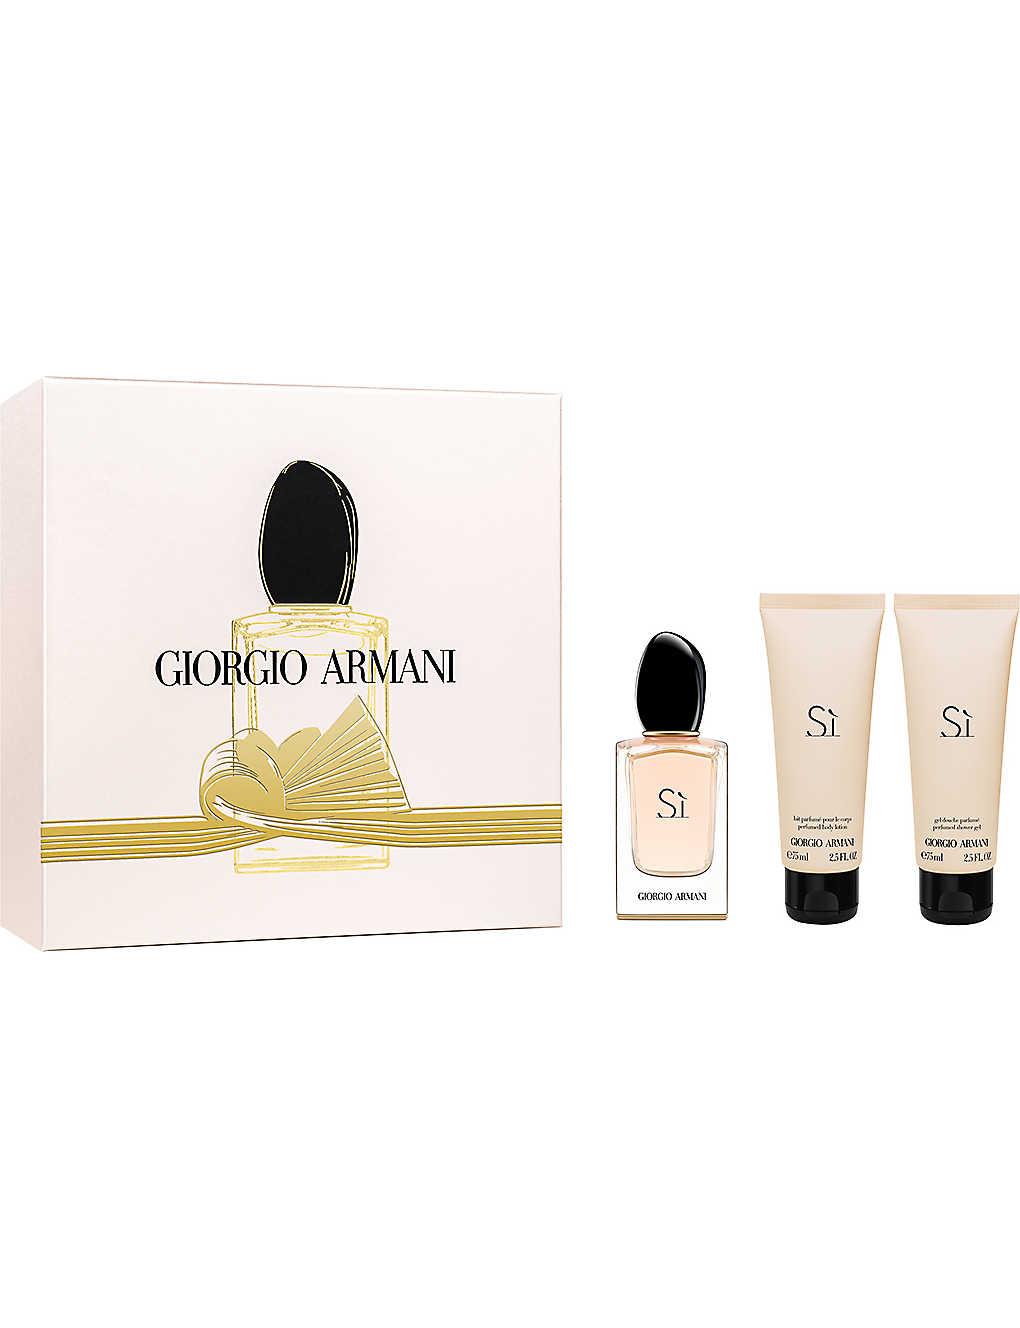 Giorgio Armani Si Eau De Parfum Gift Set 50ml Selfridgescom